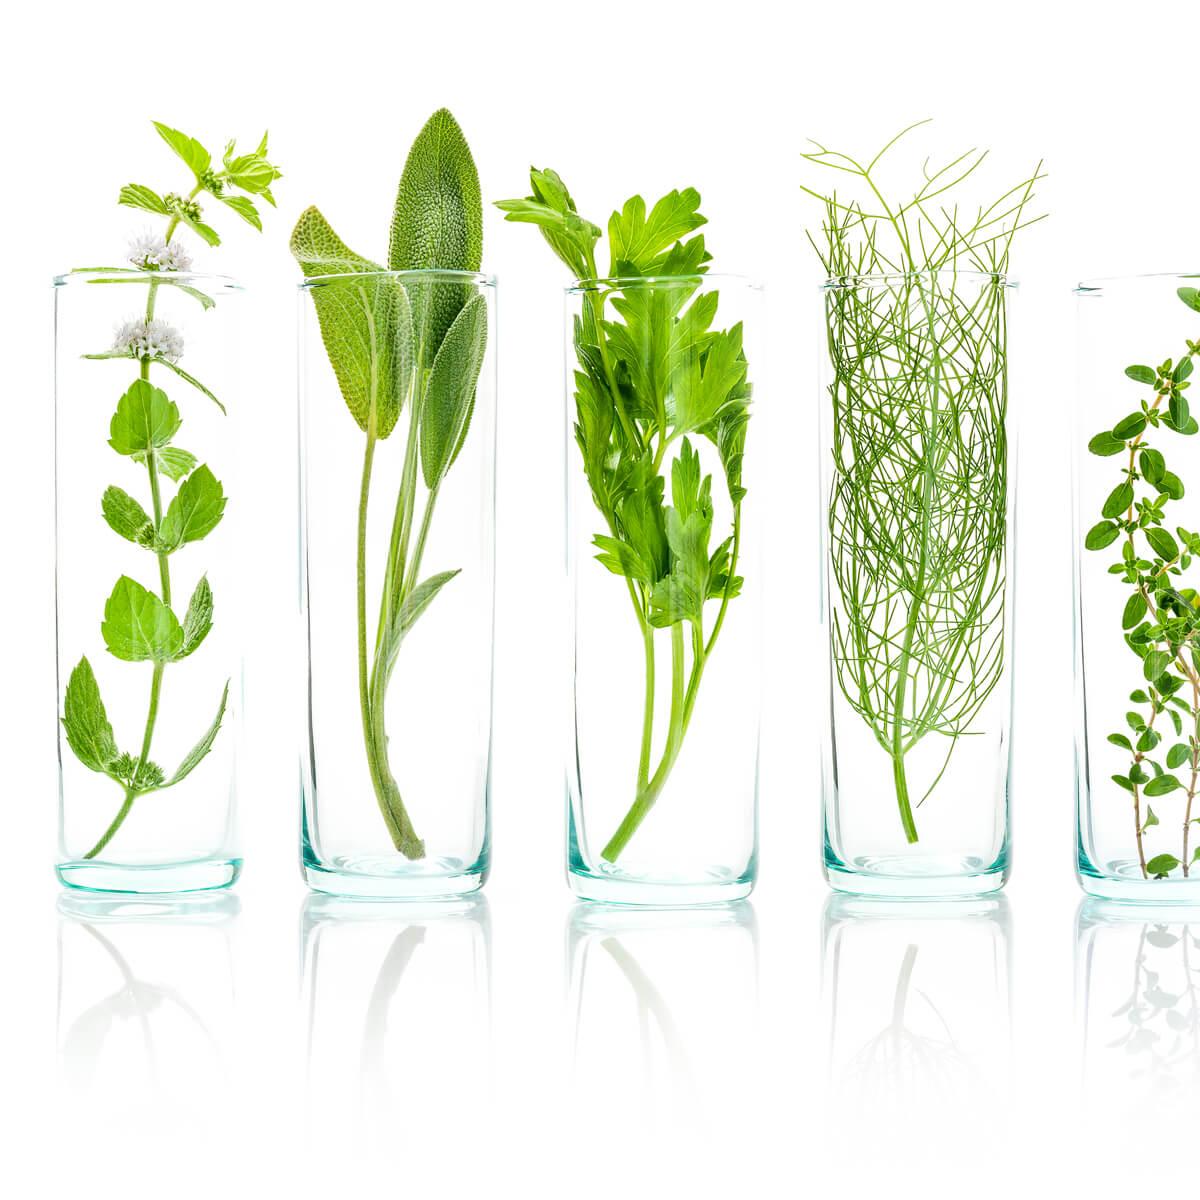 <ul> <li>تصنيف العينات</li> <li>طحن وتكييف المواد البيولوجية</li> <li>المعالجة القبلية للمواد النباتية، التحلل الجزئي وغيرها</li> </ul>